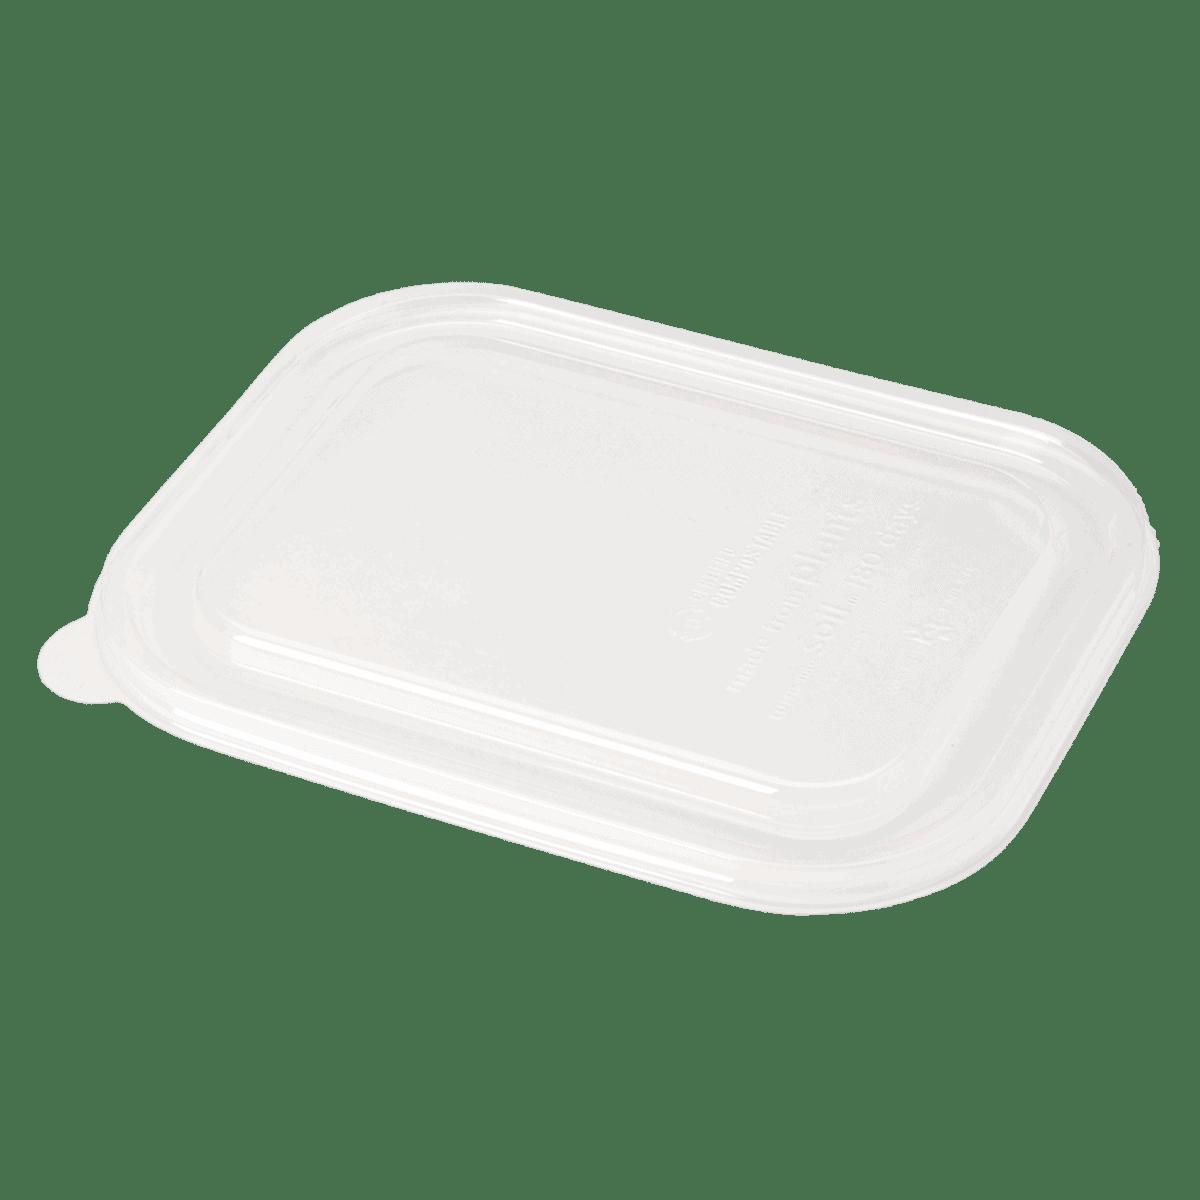 LID PLA clear lid for TR-SC-U8, TR-SC-U8L fiber containers